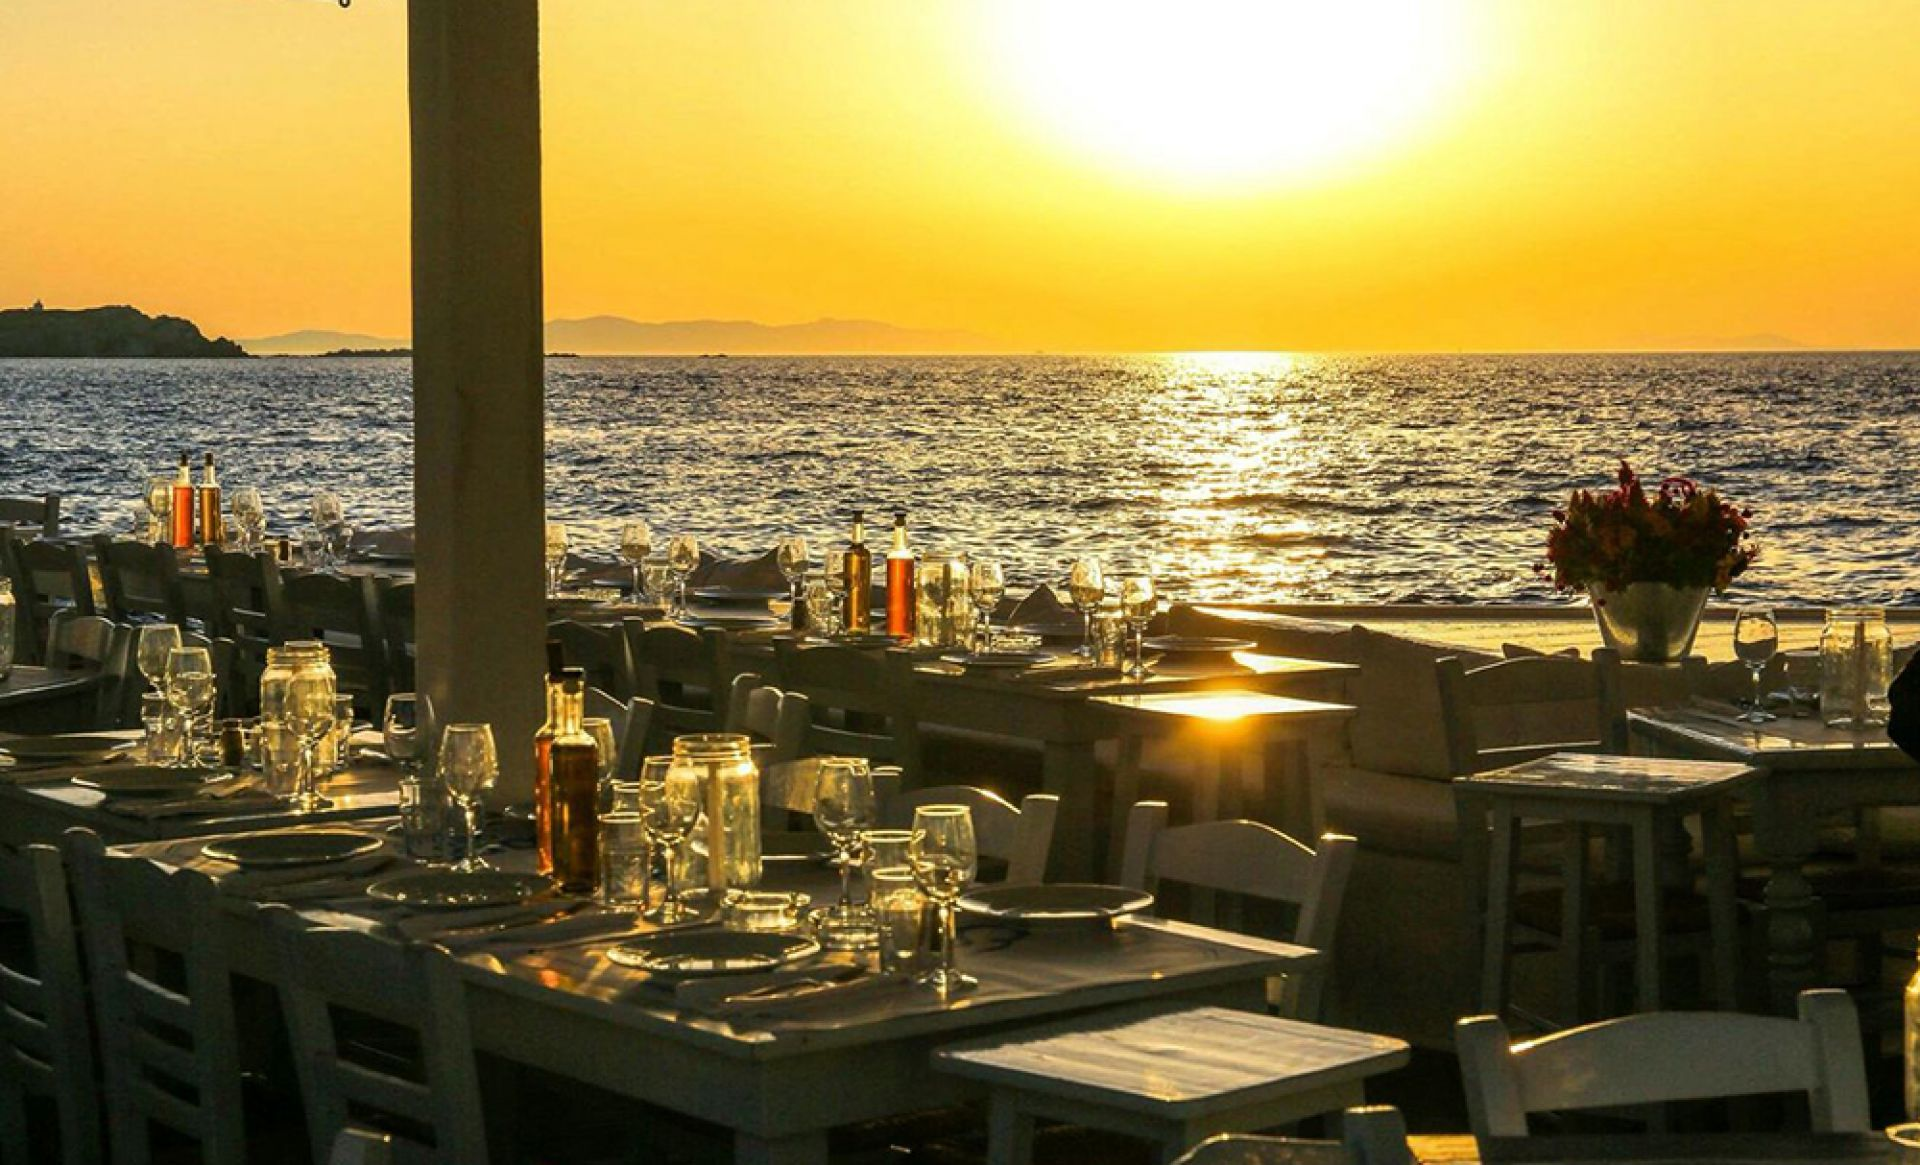 Sea Satin Market - Dinner Venue in Mykonos